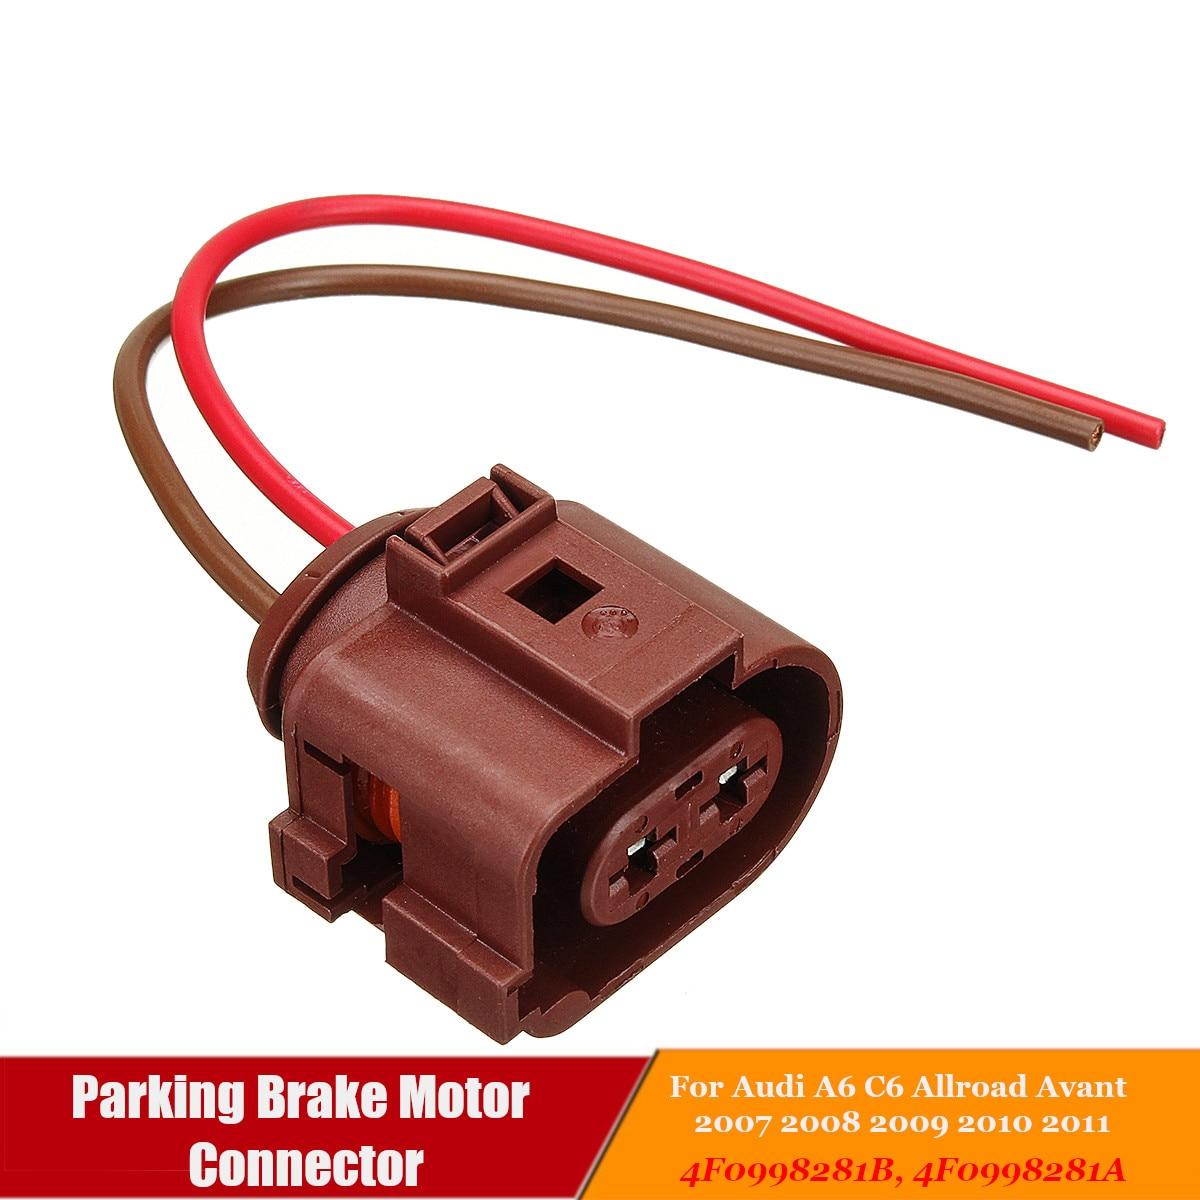 medium resolution of 4f0998281b car parking brake motor wiring harness connector for audi a6 c6 allroad avant 2007